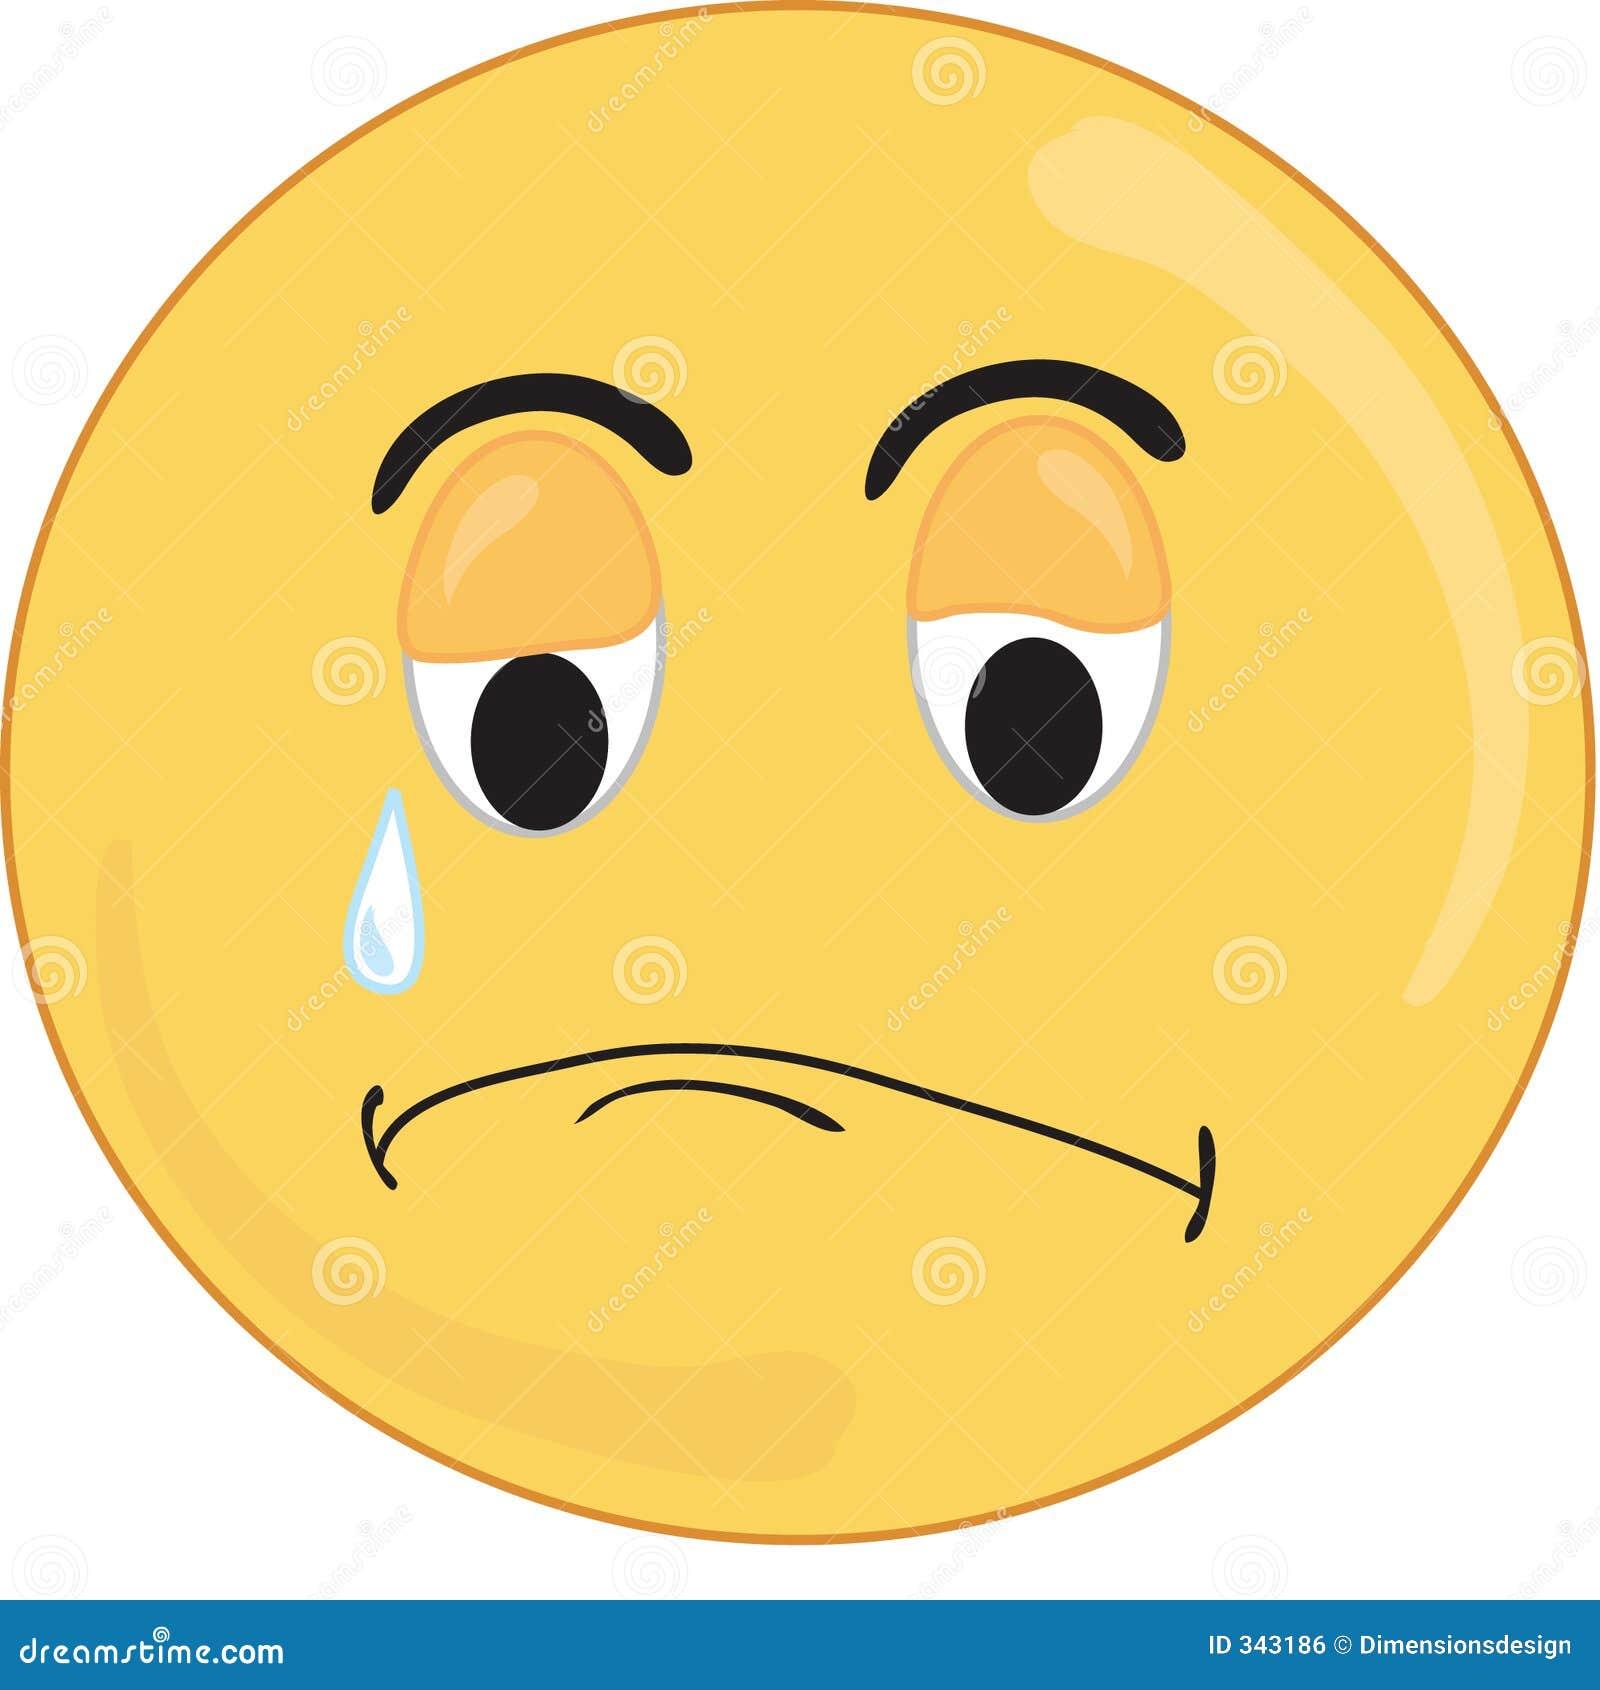 Sad: Sad Face Royalty Free Stock Image